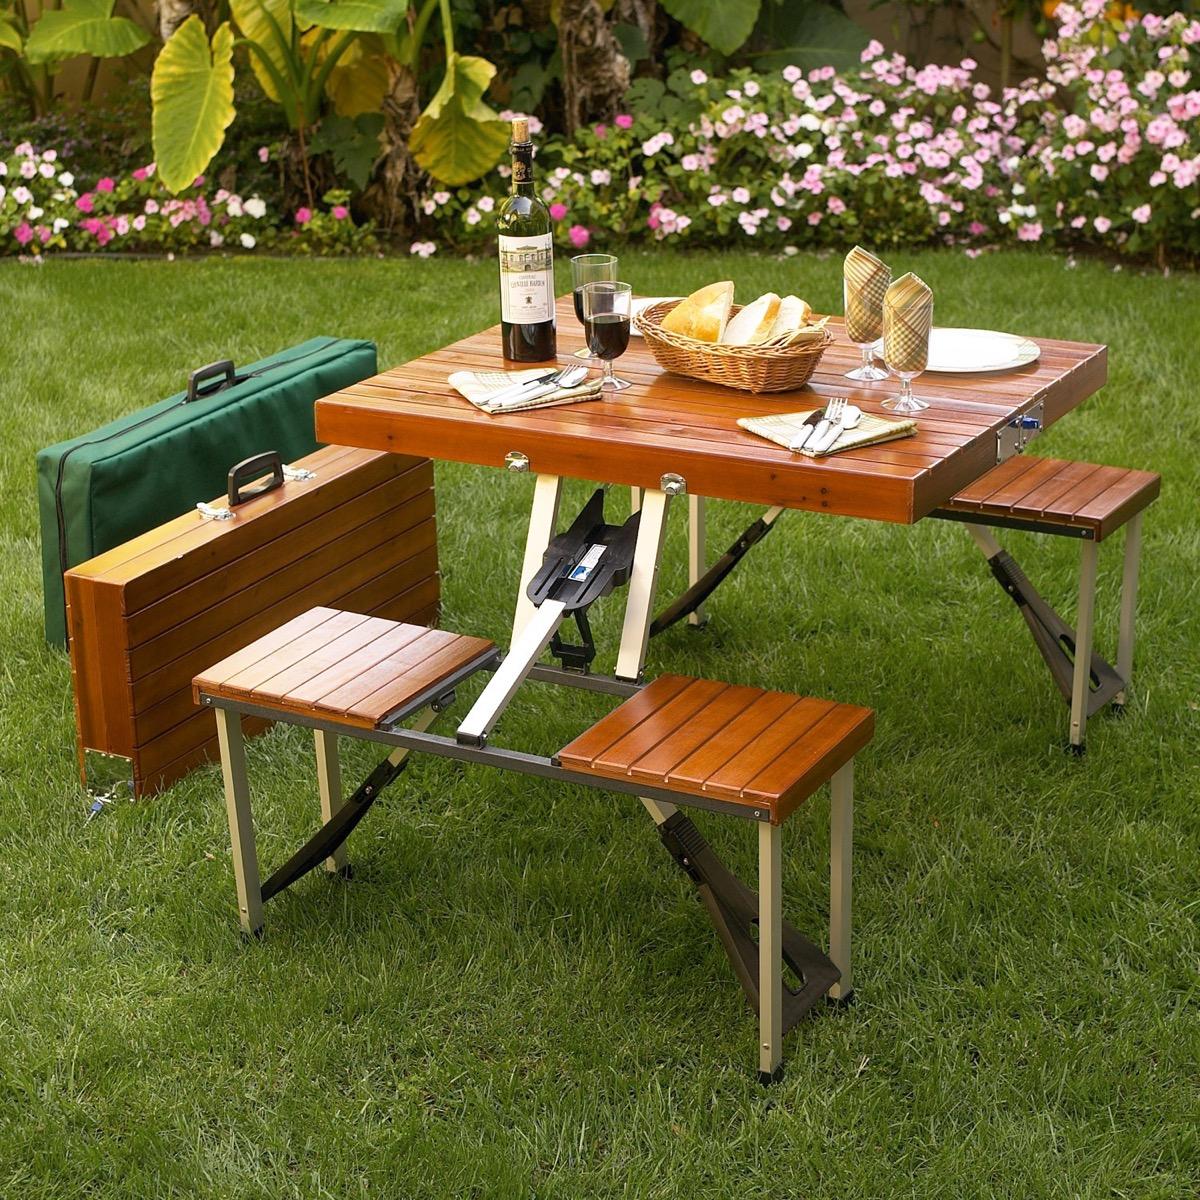 ascot portable picnic table set